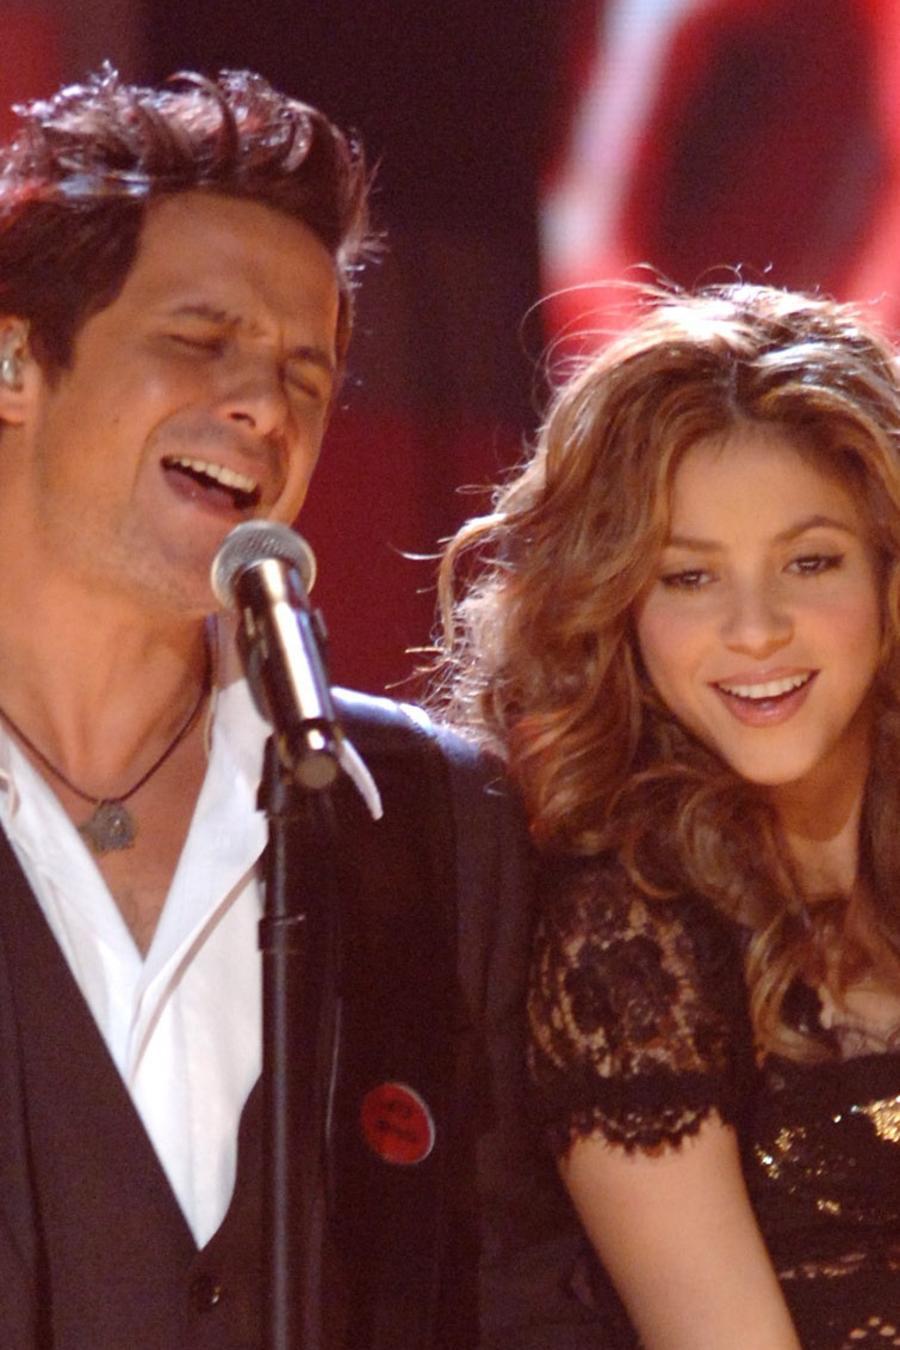 Alejandro Sanz and Shakira perform together